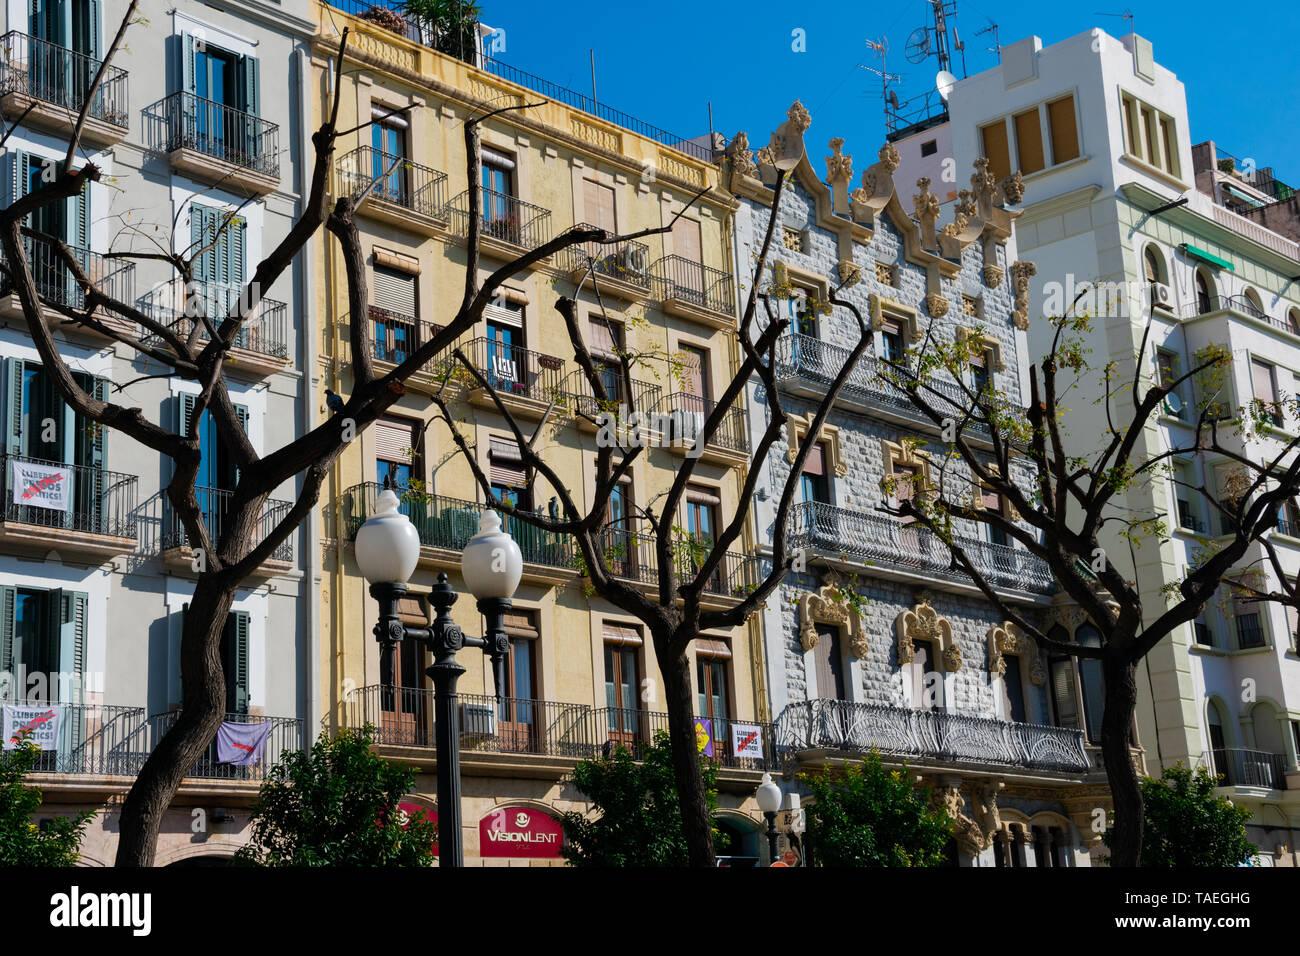 Tarragona, Spain. February 8, 2019. Old building facades in Rambla Nova, a main city walk with restaurants and shops - Stock Image